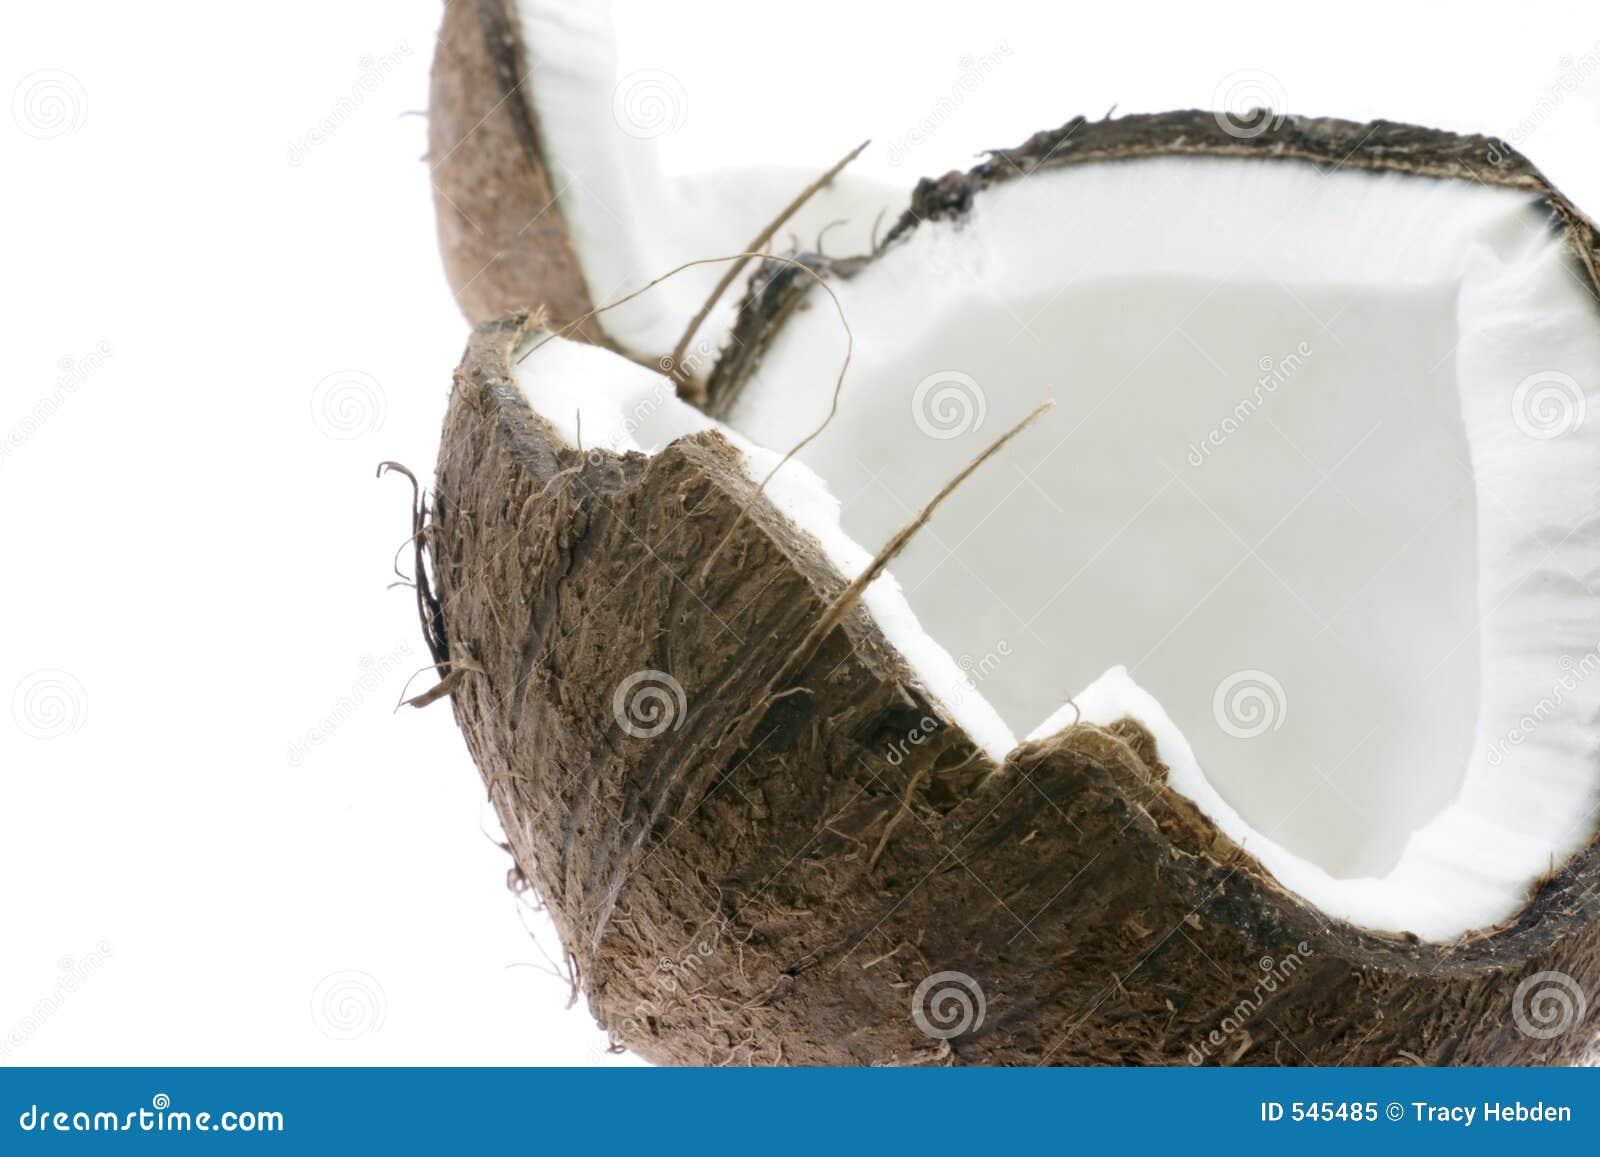 Download 椰子 库存图片. 图片 包括有 食物, 自然, 成份, 健康, 椰子, 结构树, 牛奶, korma, 掌上型计算机 - 545485